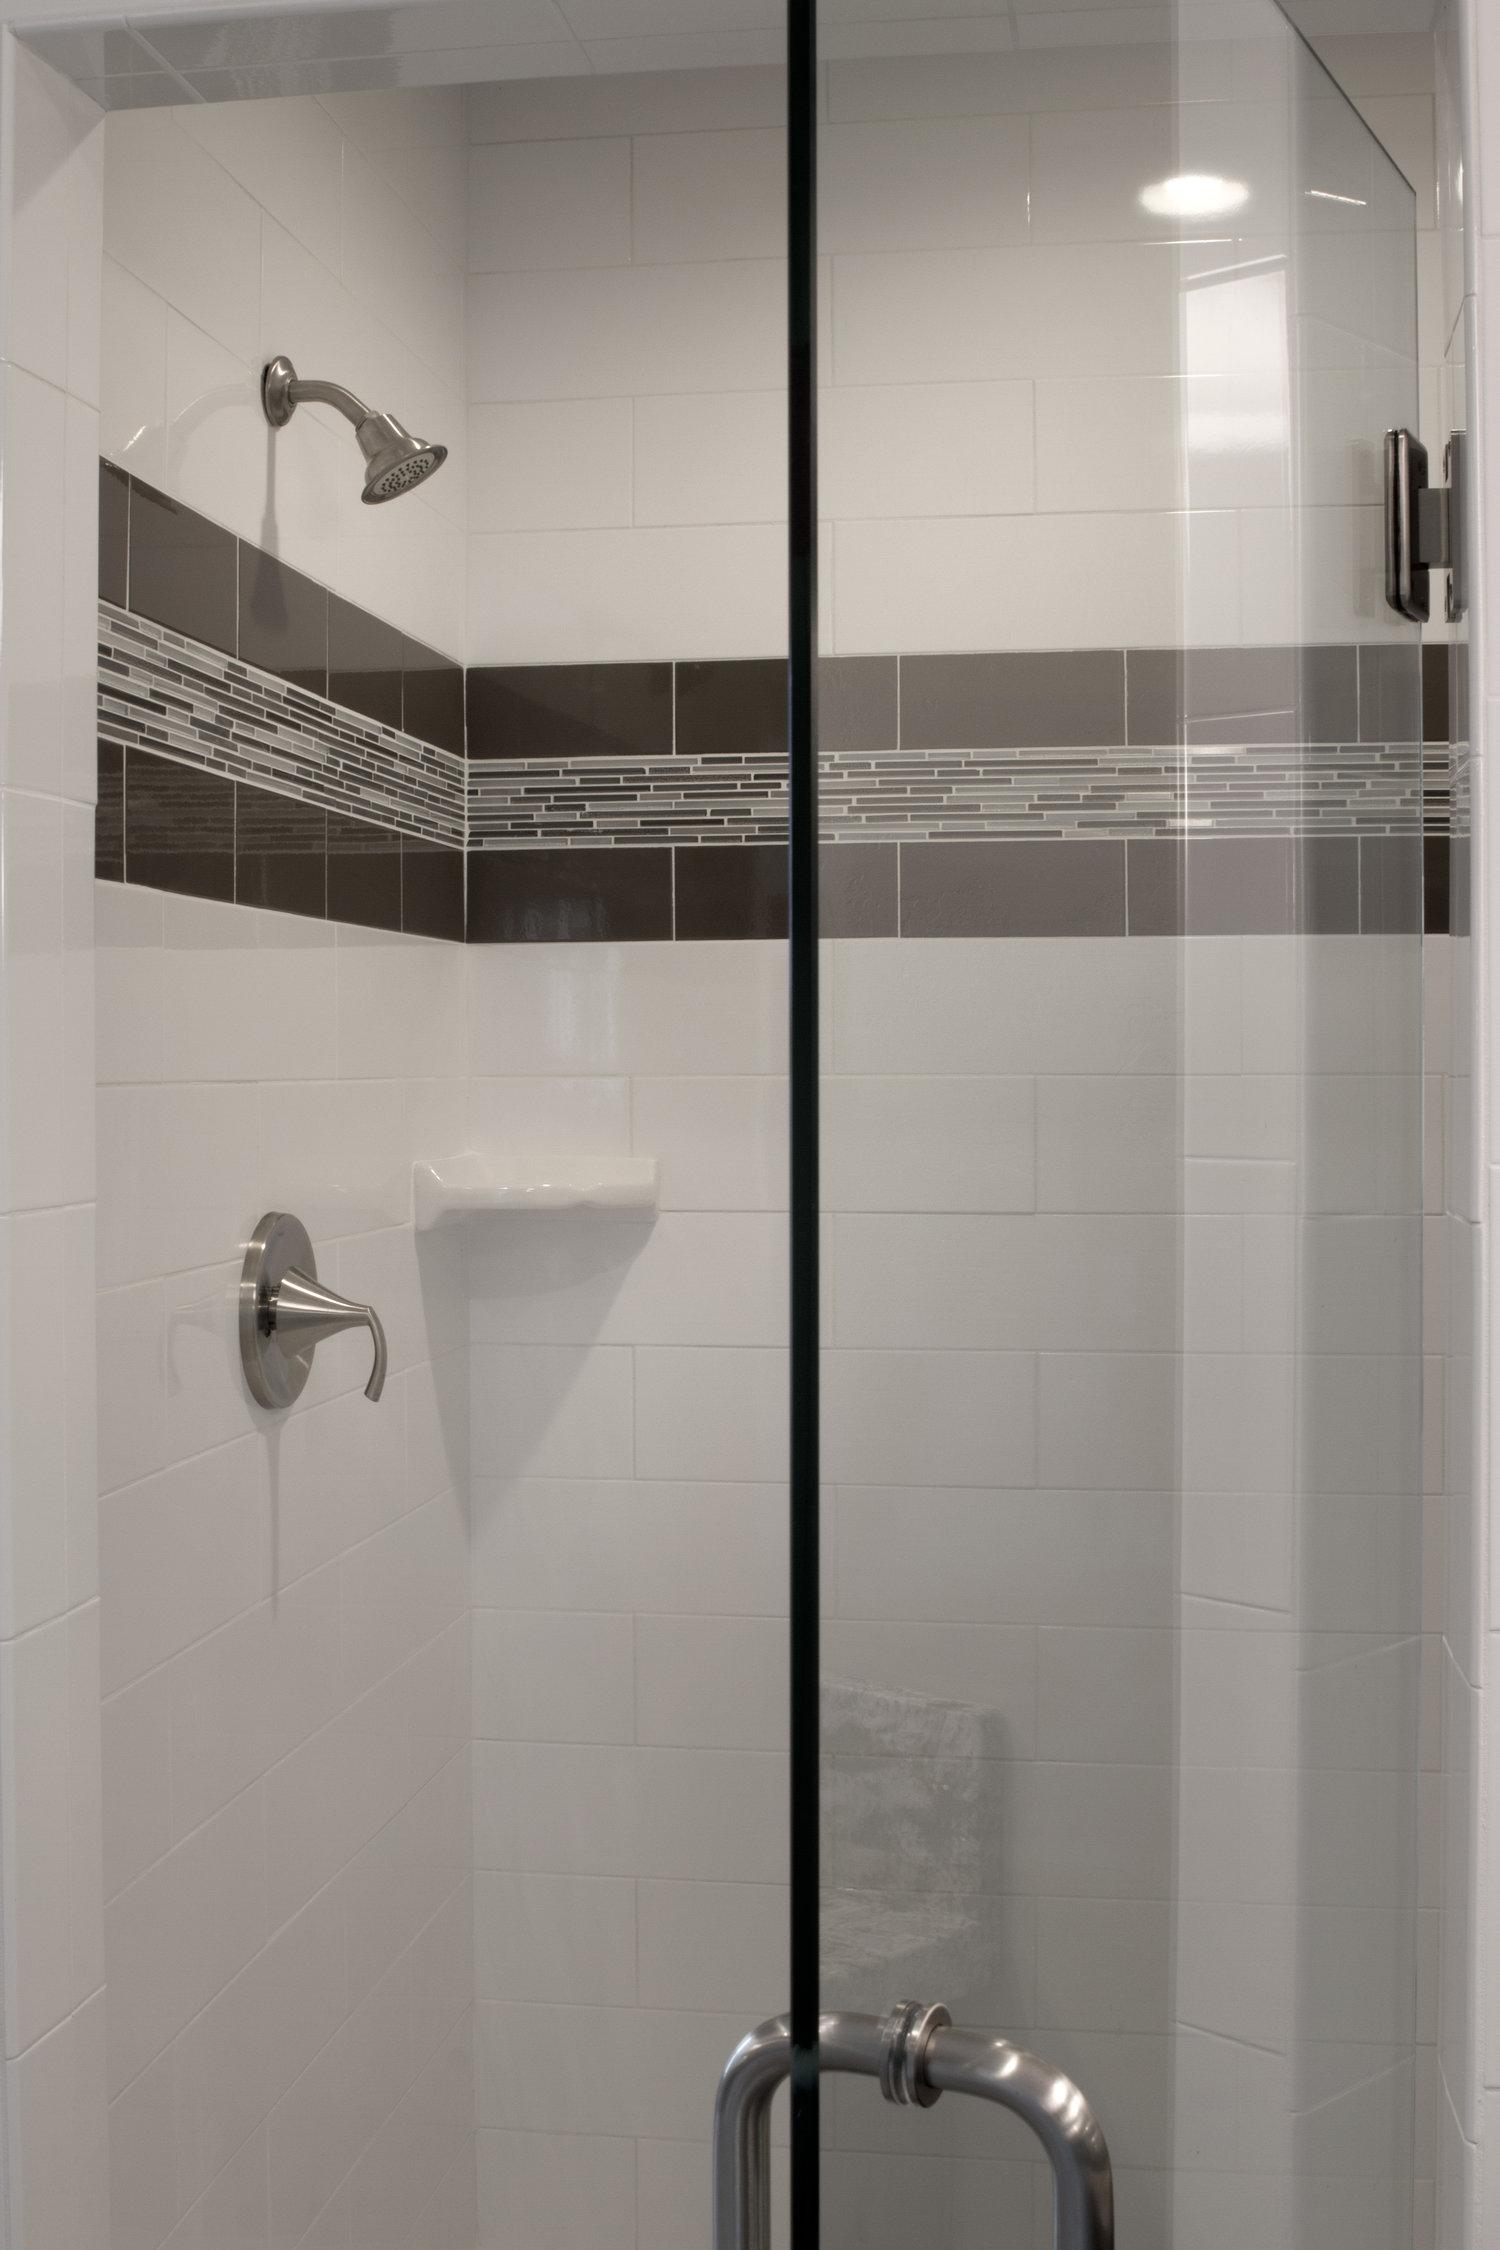 design tiles the choosing bathroom designs tile shower